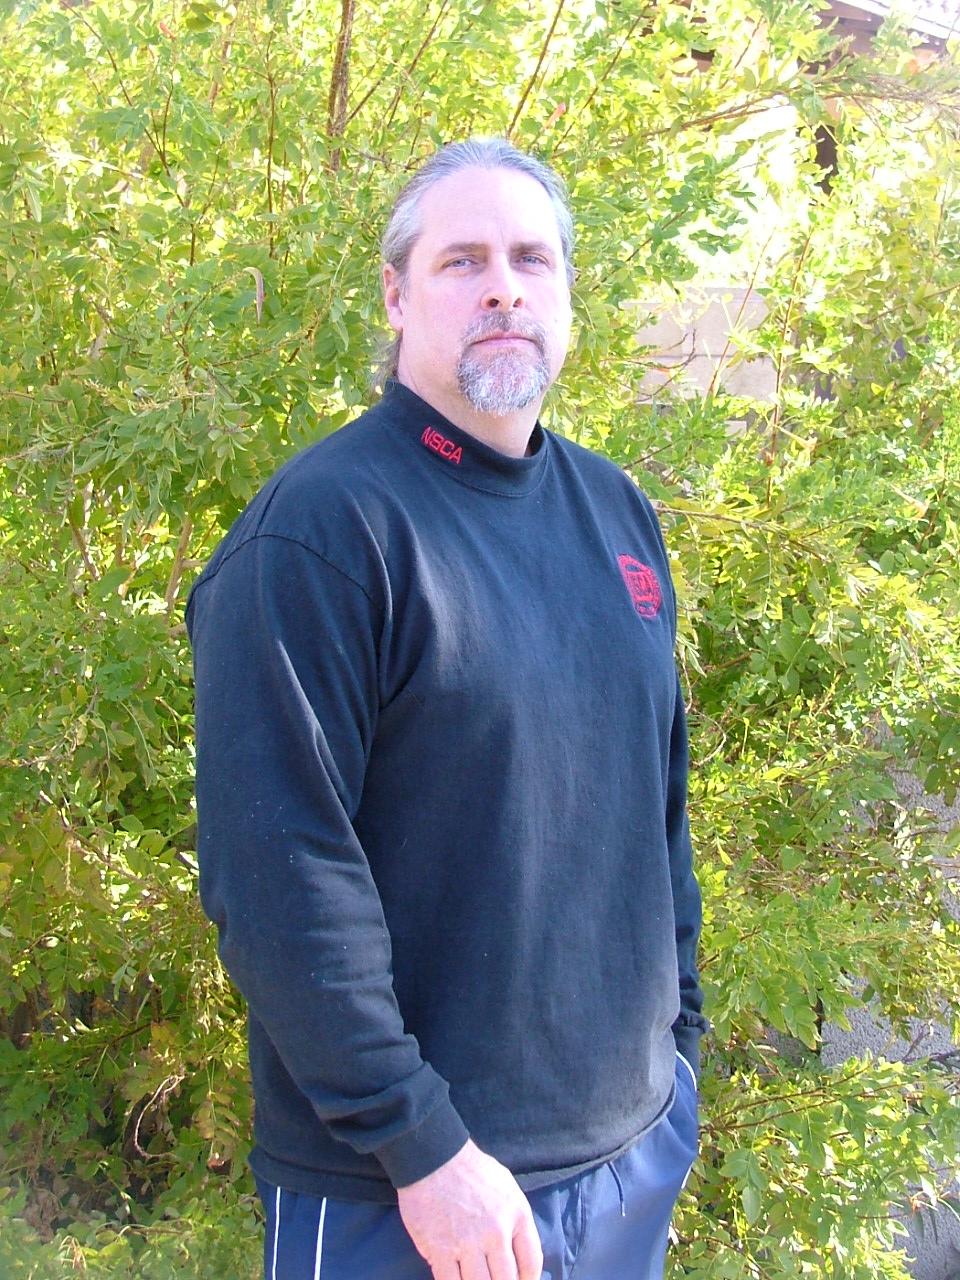 2 X Fitness - health  | Photo 4 of 8 | Address: 1503 N 26th St, Mesa, AZ 85213, USA | Phone: (480) 406-1570